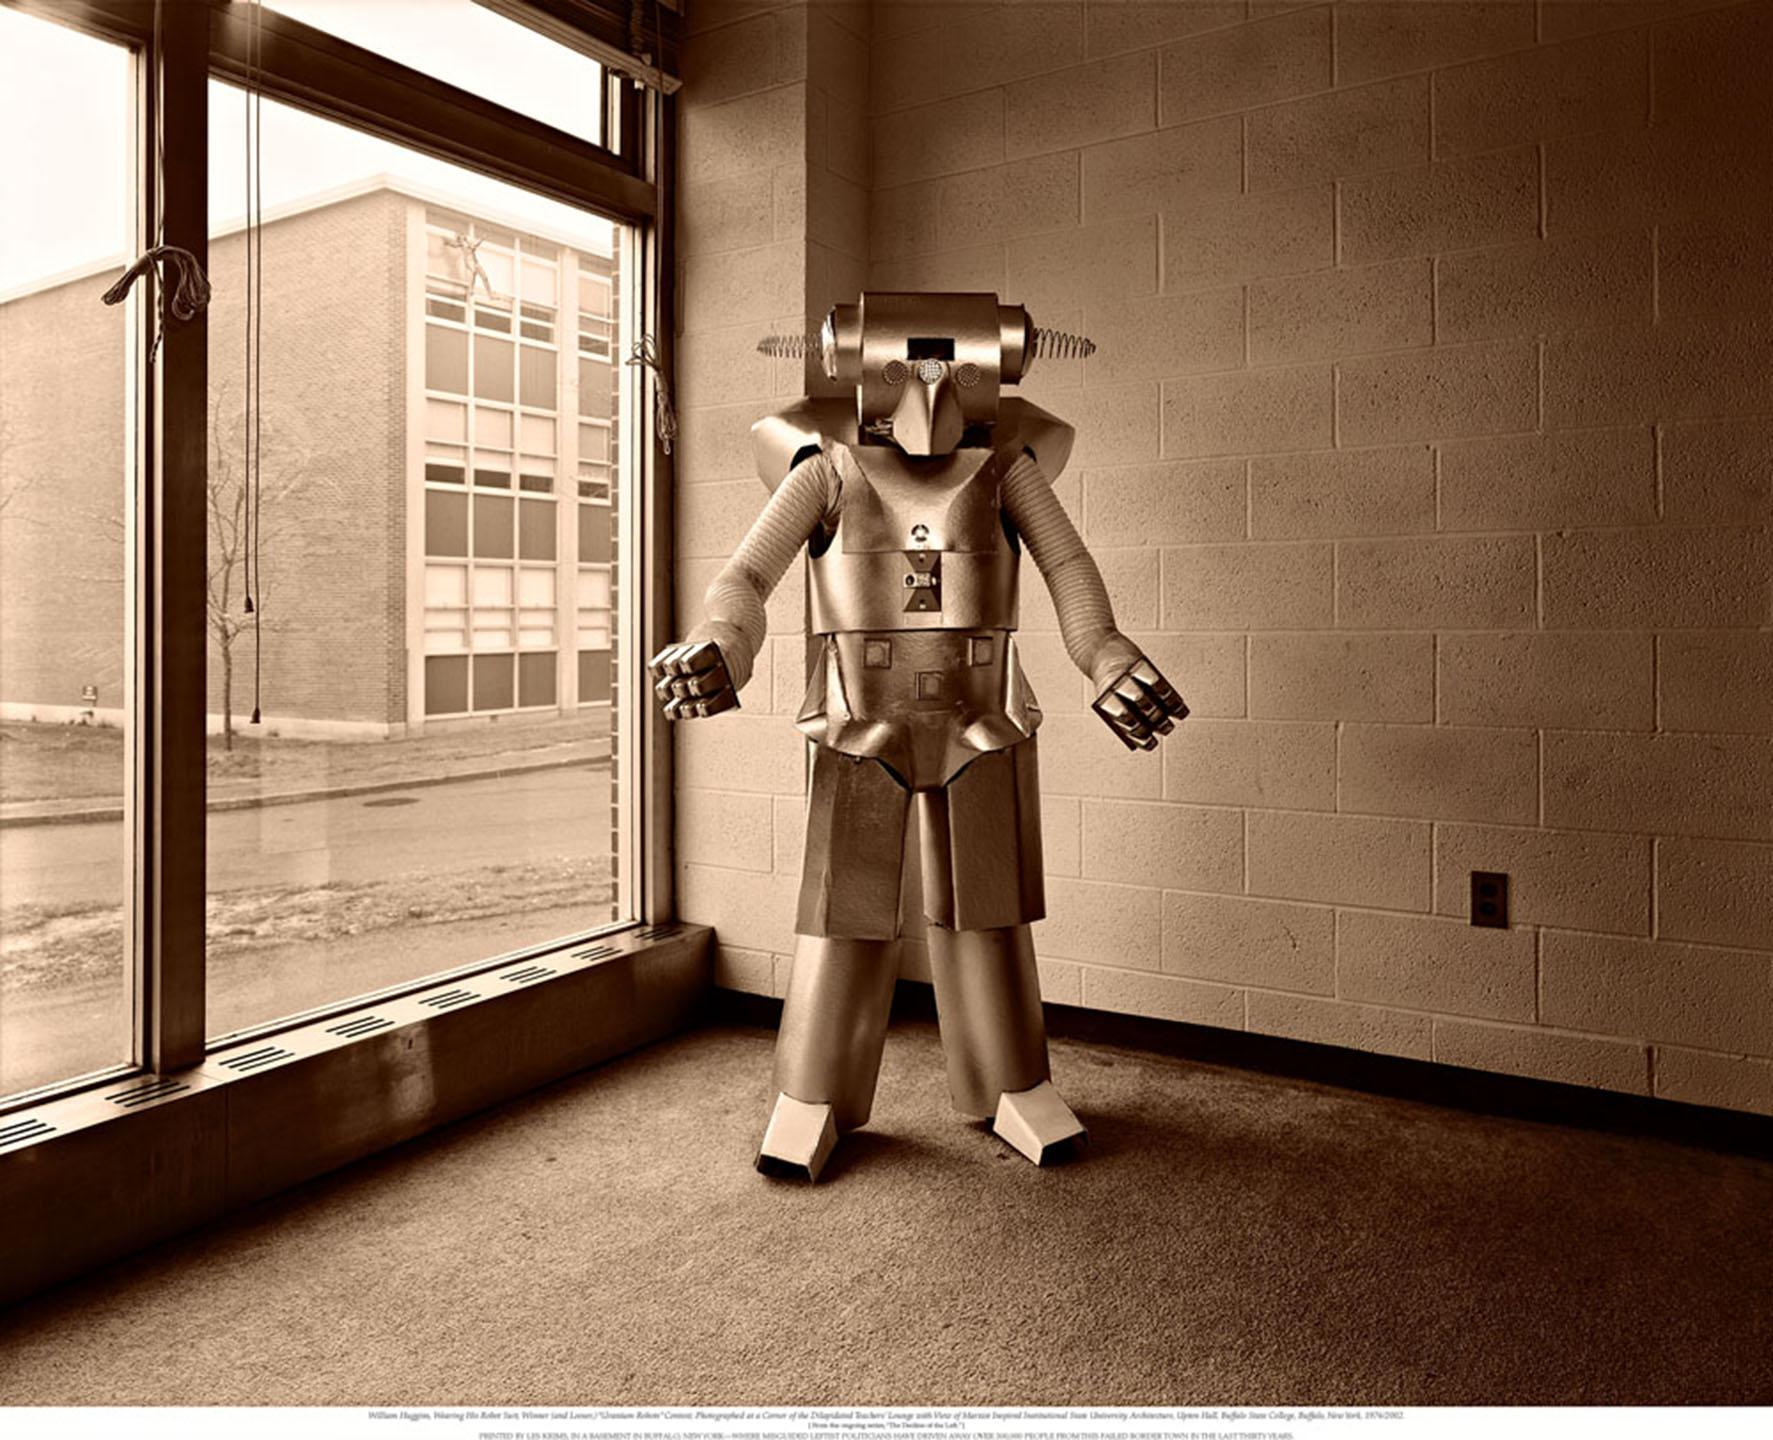 Winner & Looser, Uranium Robot